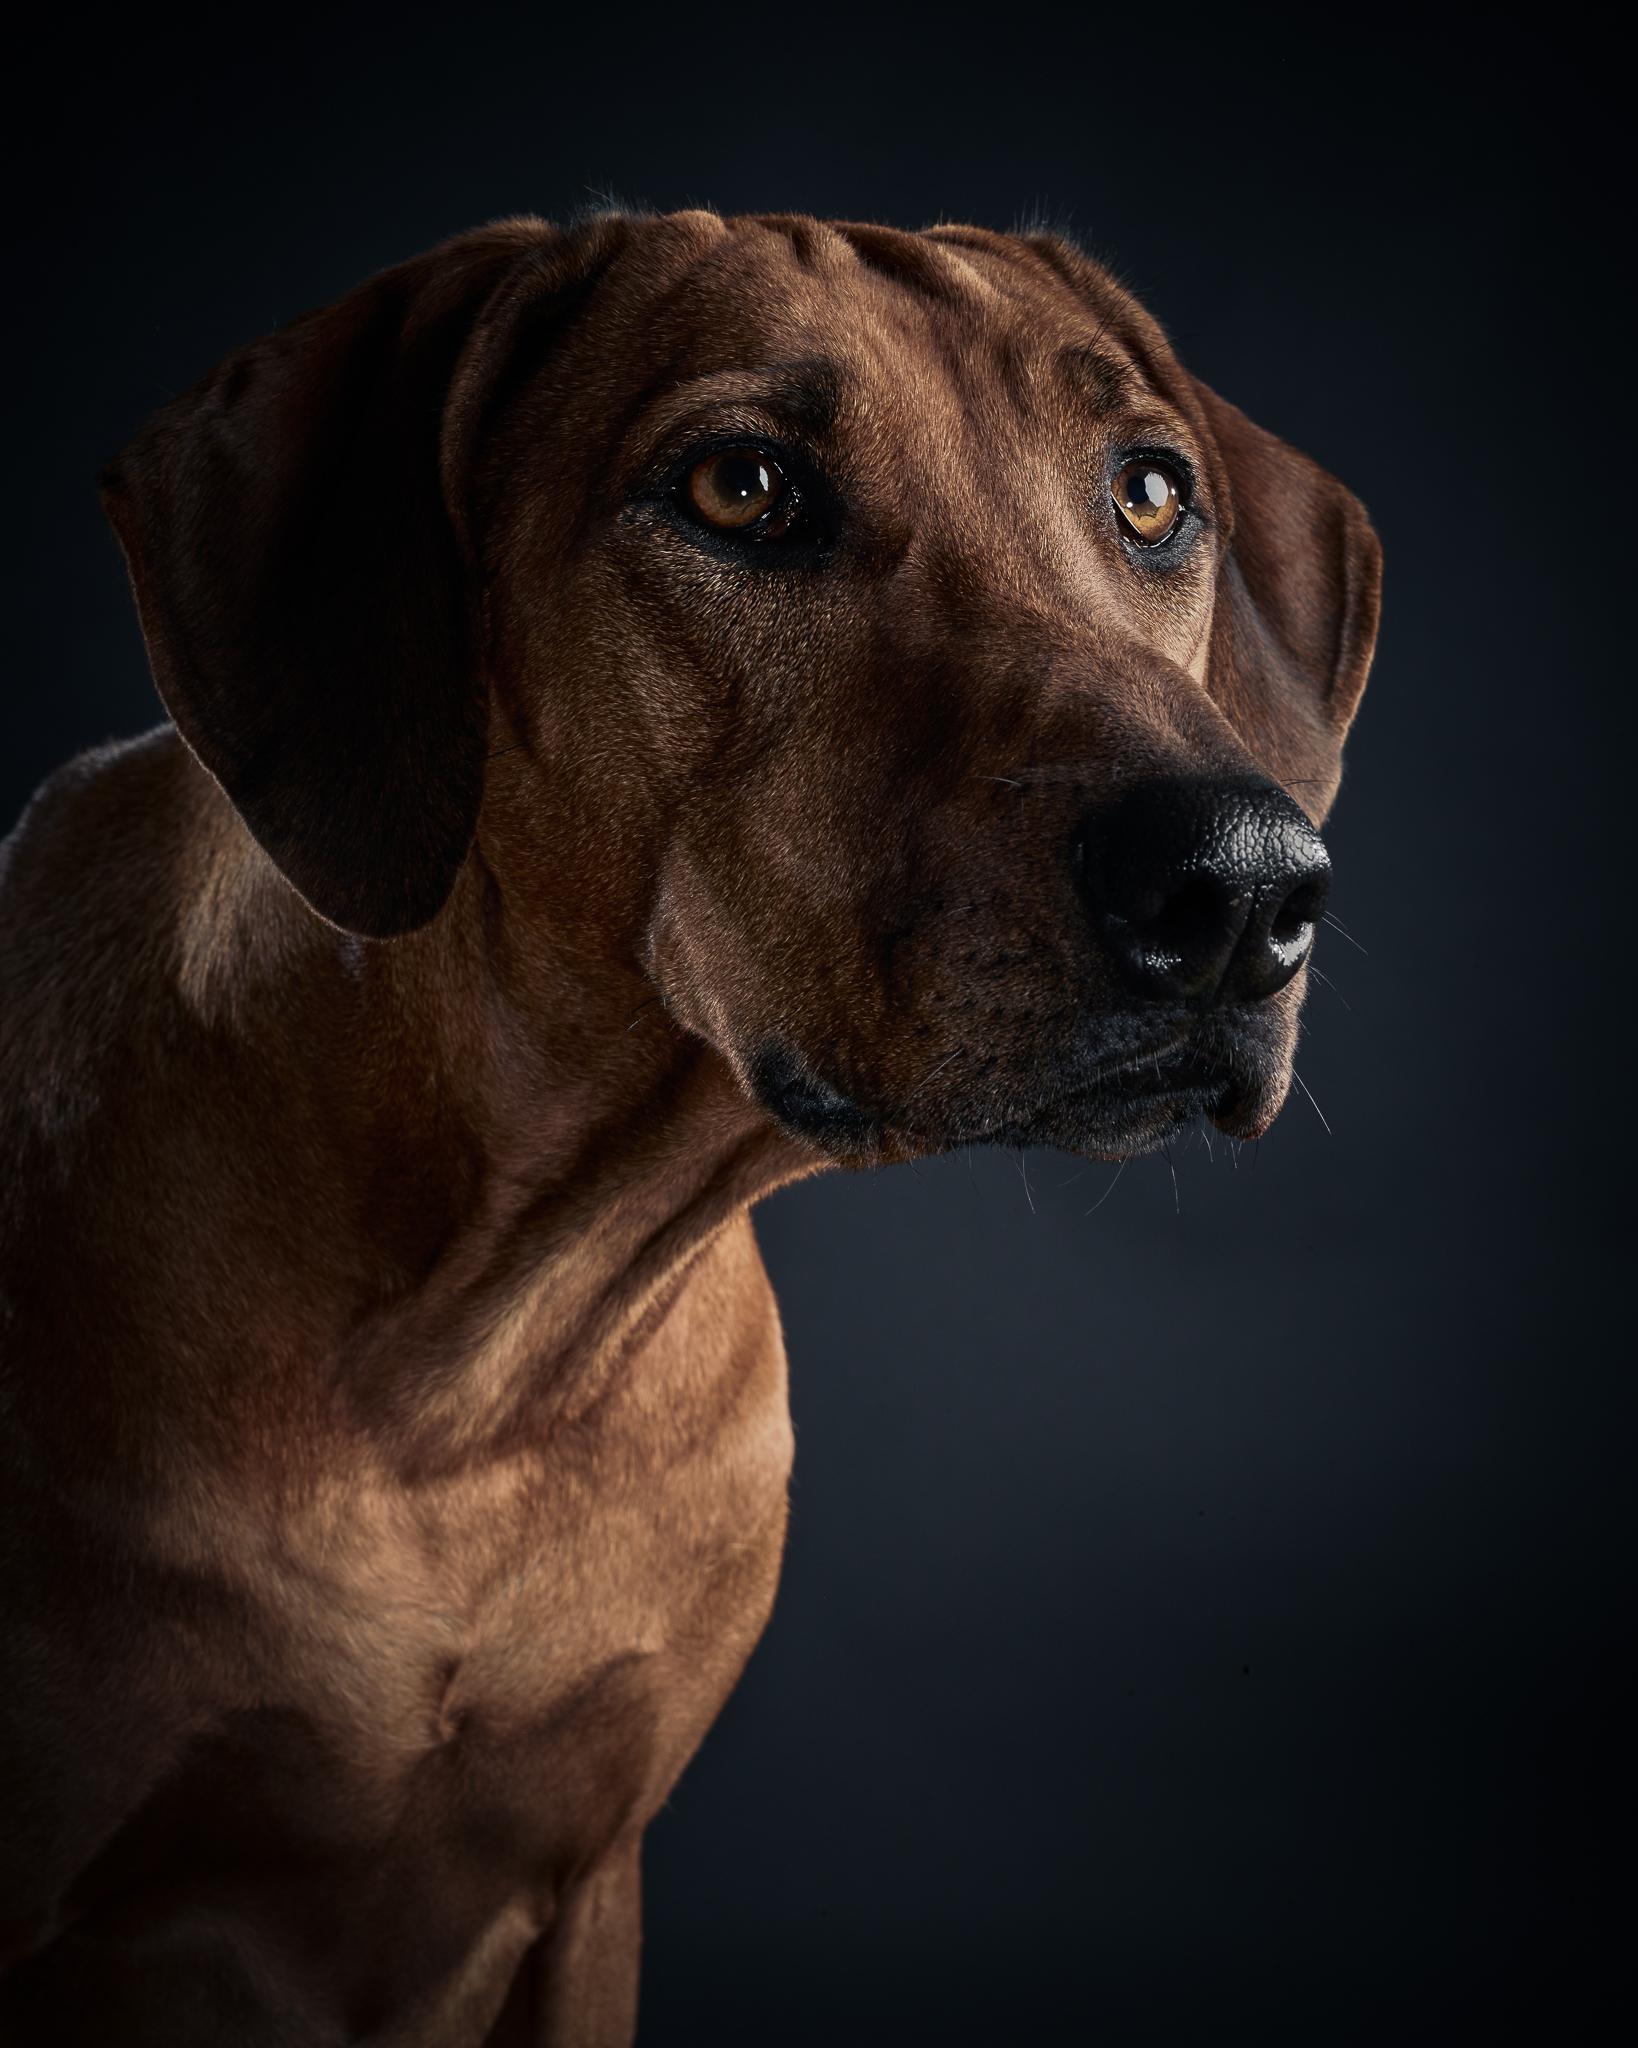 klaus-dyba-dog-photography-4.jpg